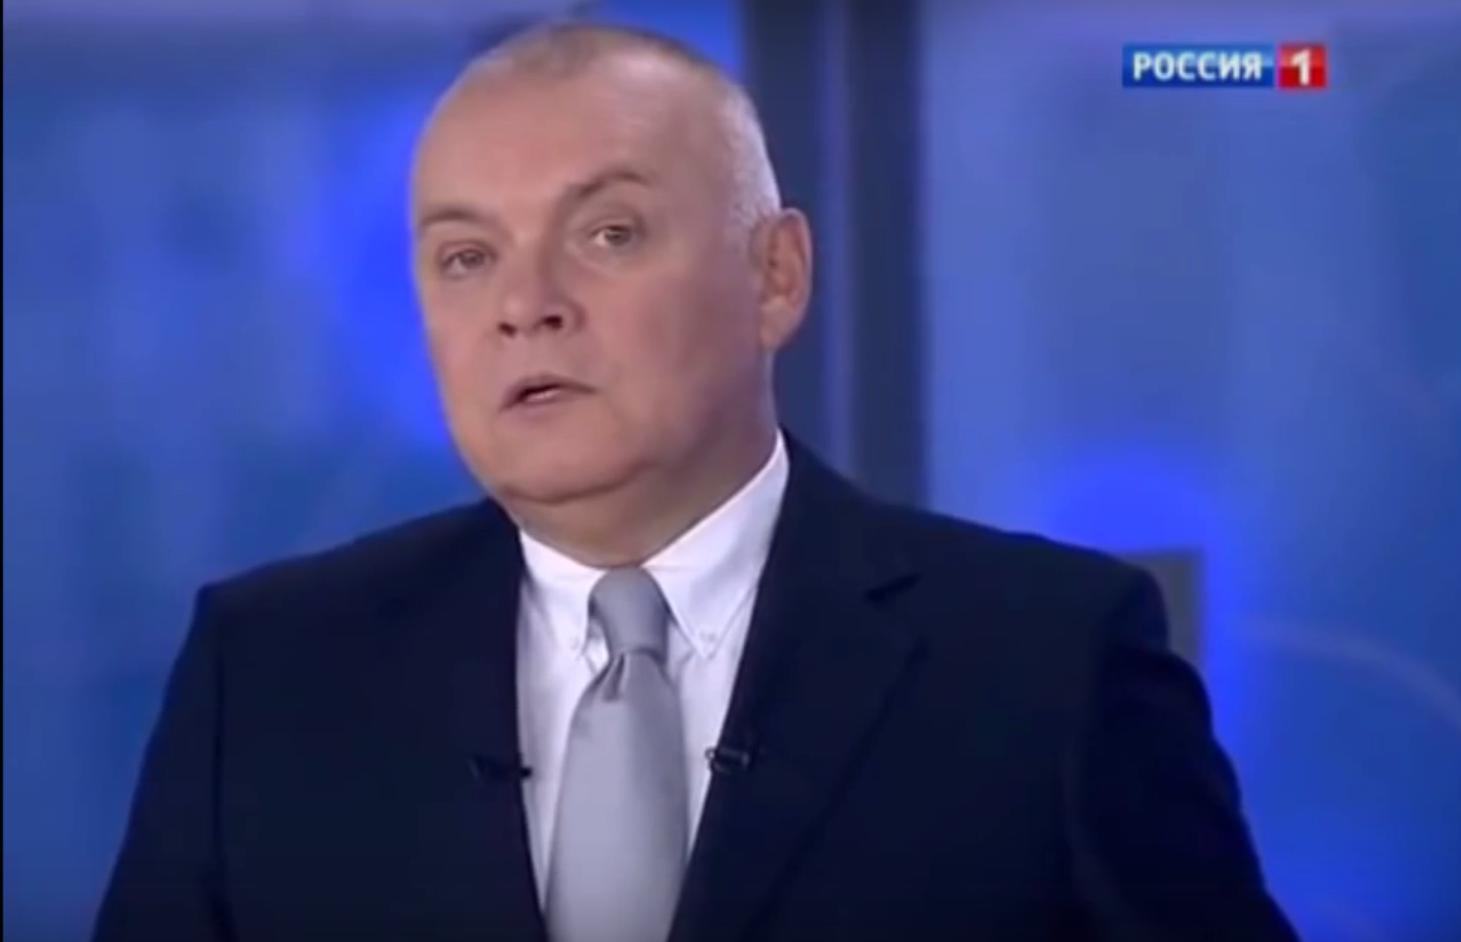 Dmitry Kiseleyov, head of Russia Segonya and popular TV host, is often described as Putin's key propagandist PHOTO: Rossia1